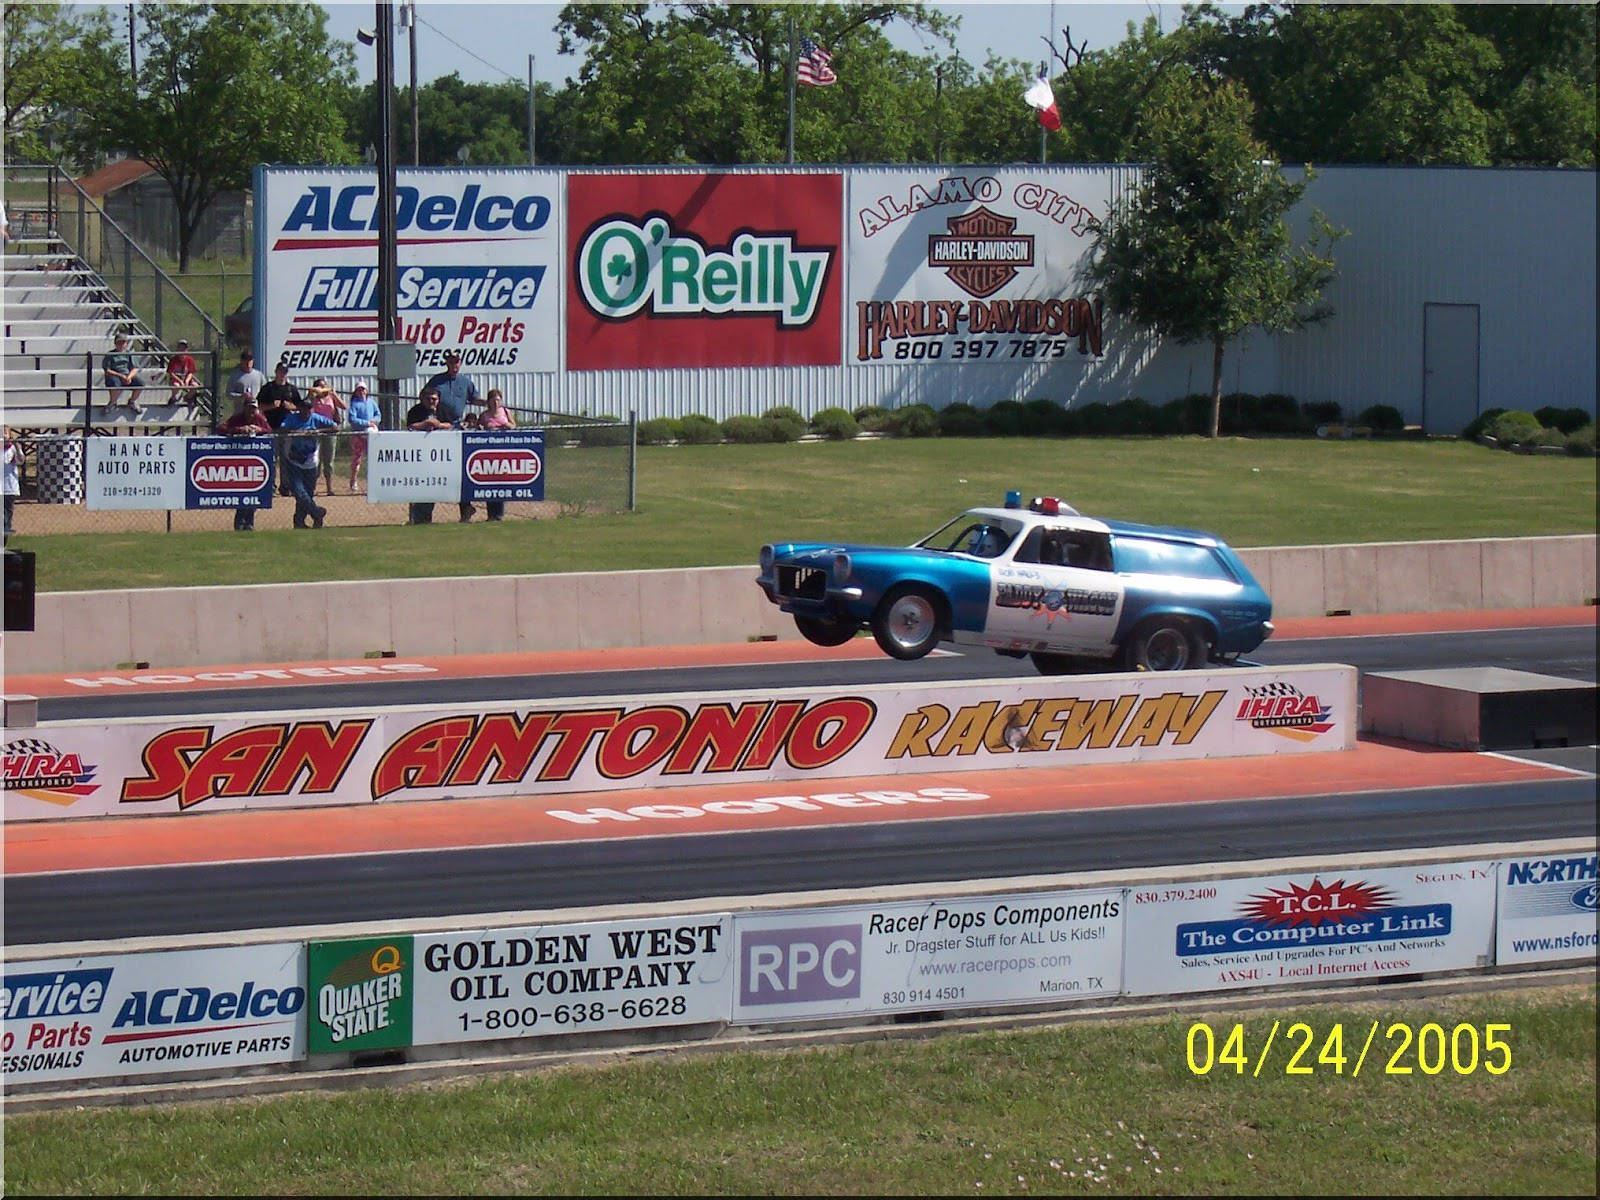 Motorheads Performance Classic Car News Visit San Antonio